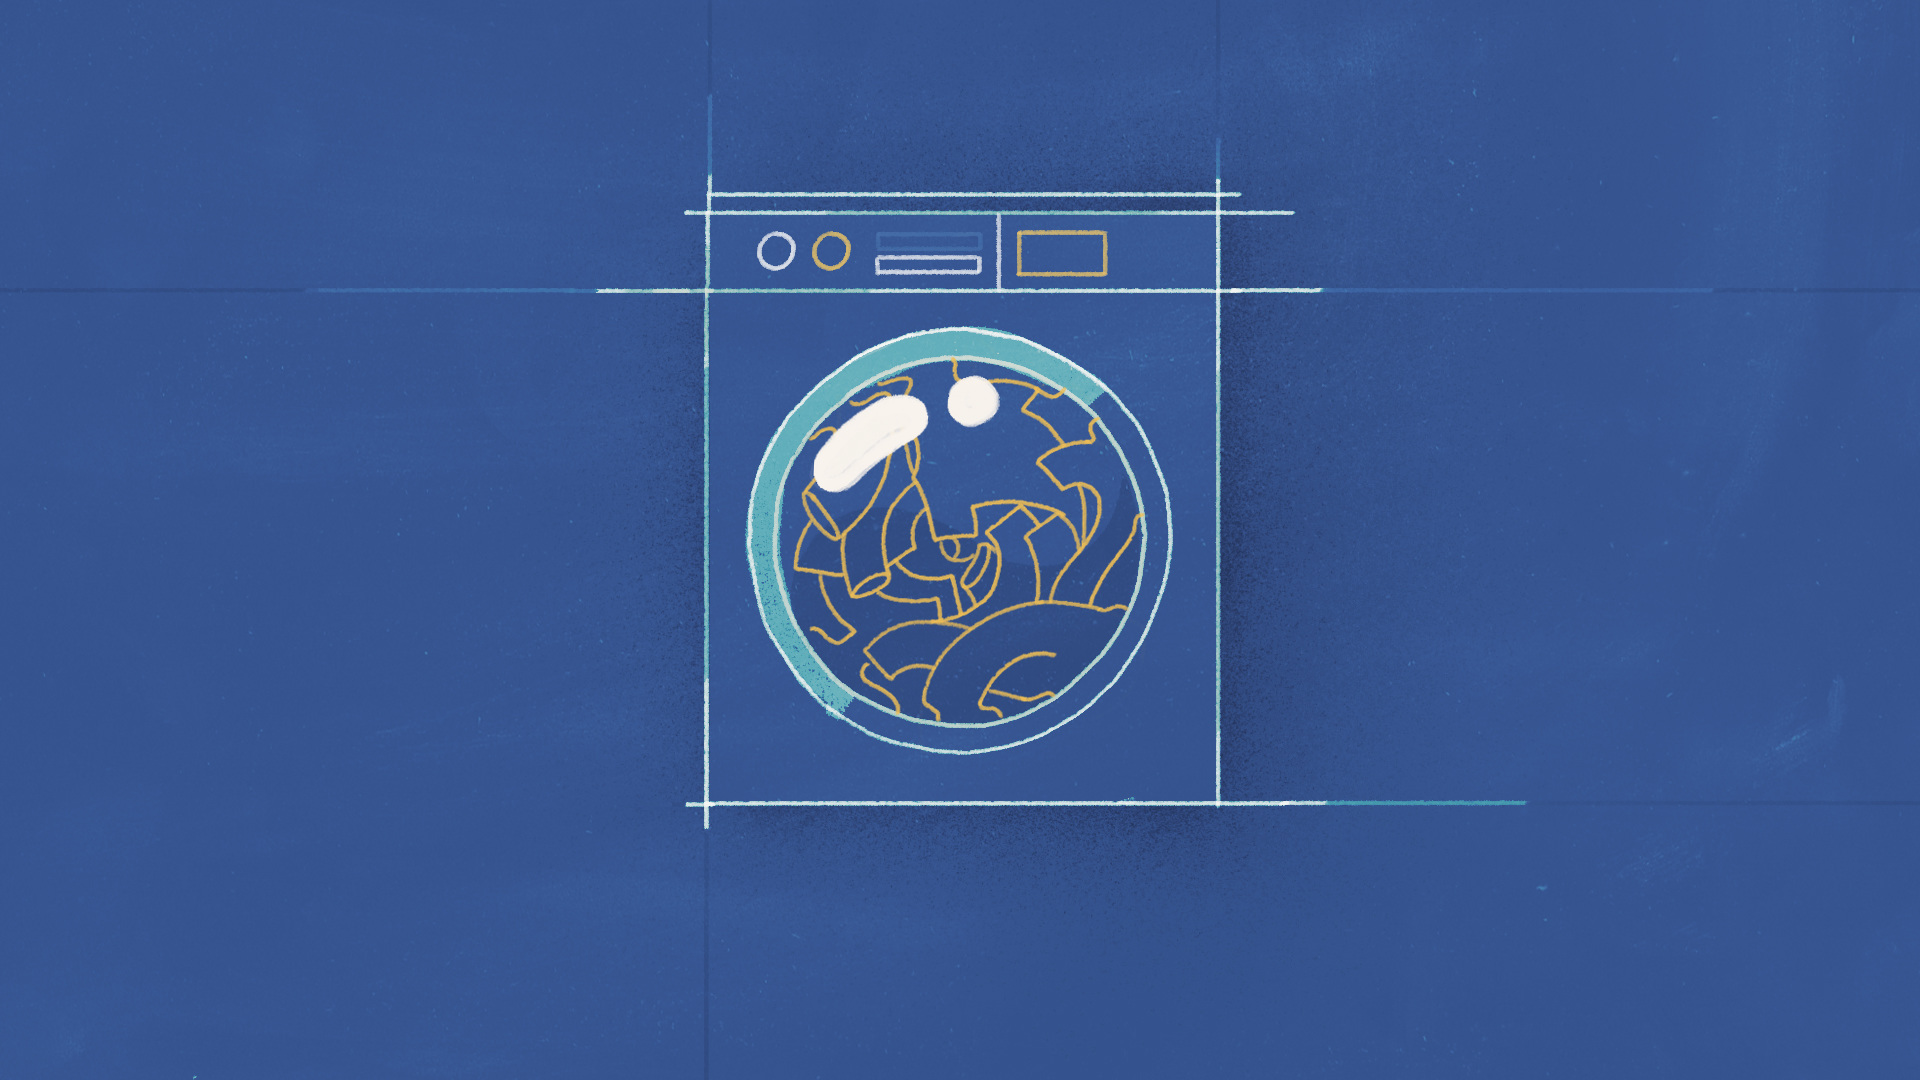 001_Busy_Laundry_05_1920.jpg